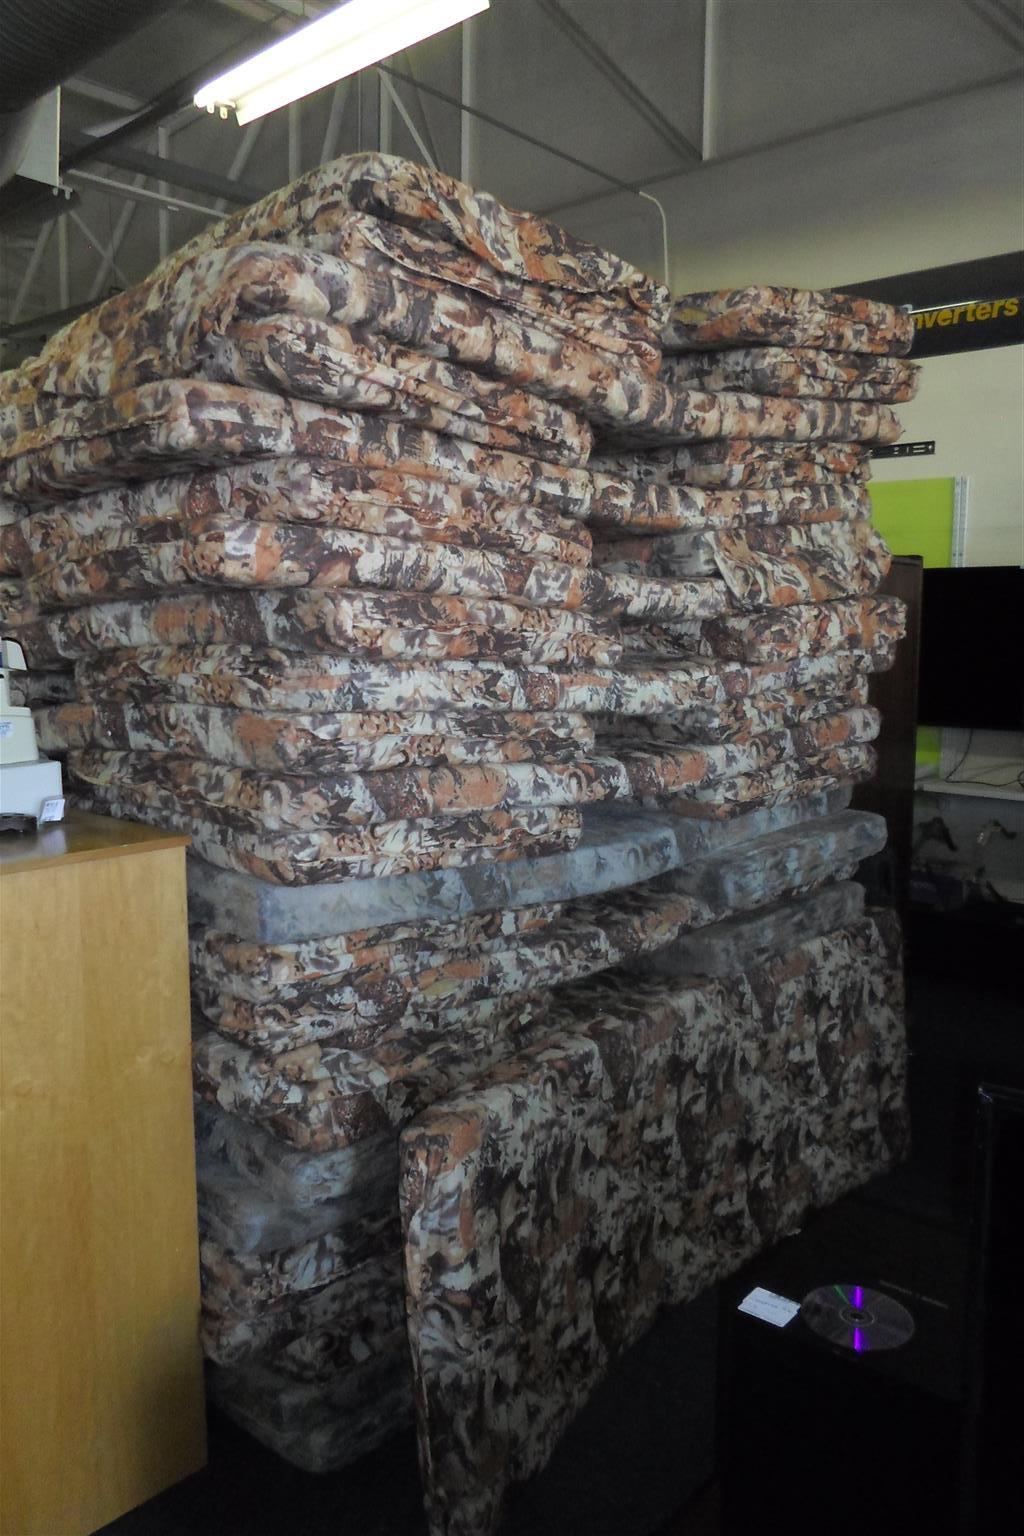 50x Covered Sponge Mattresses